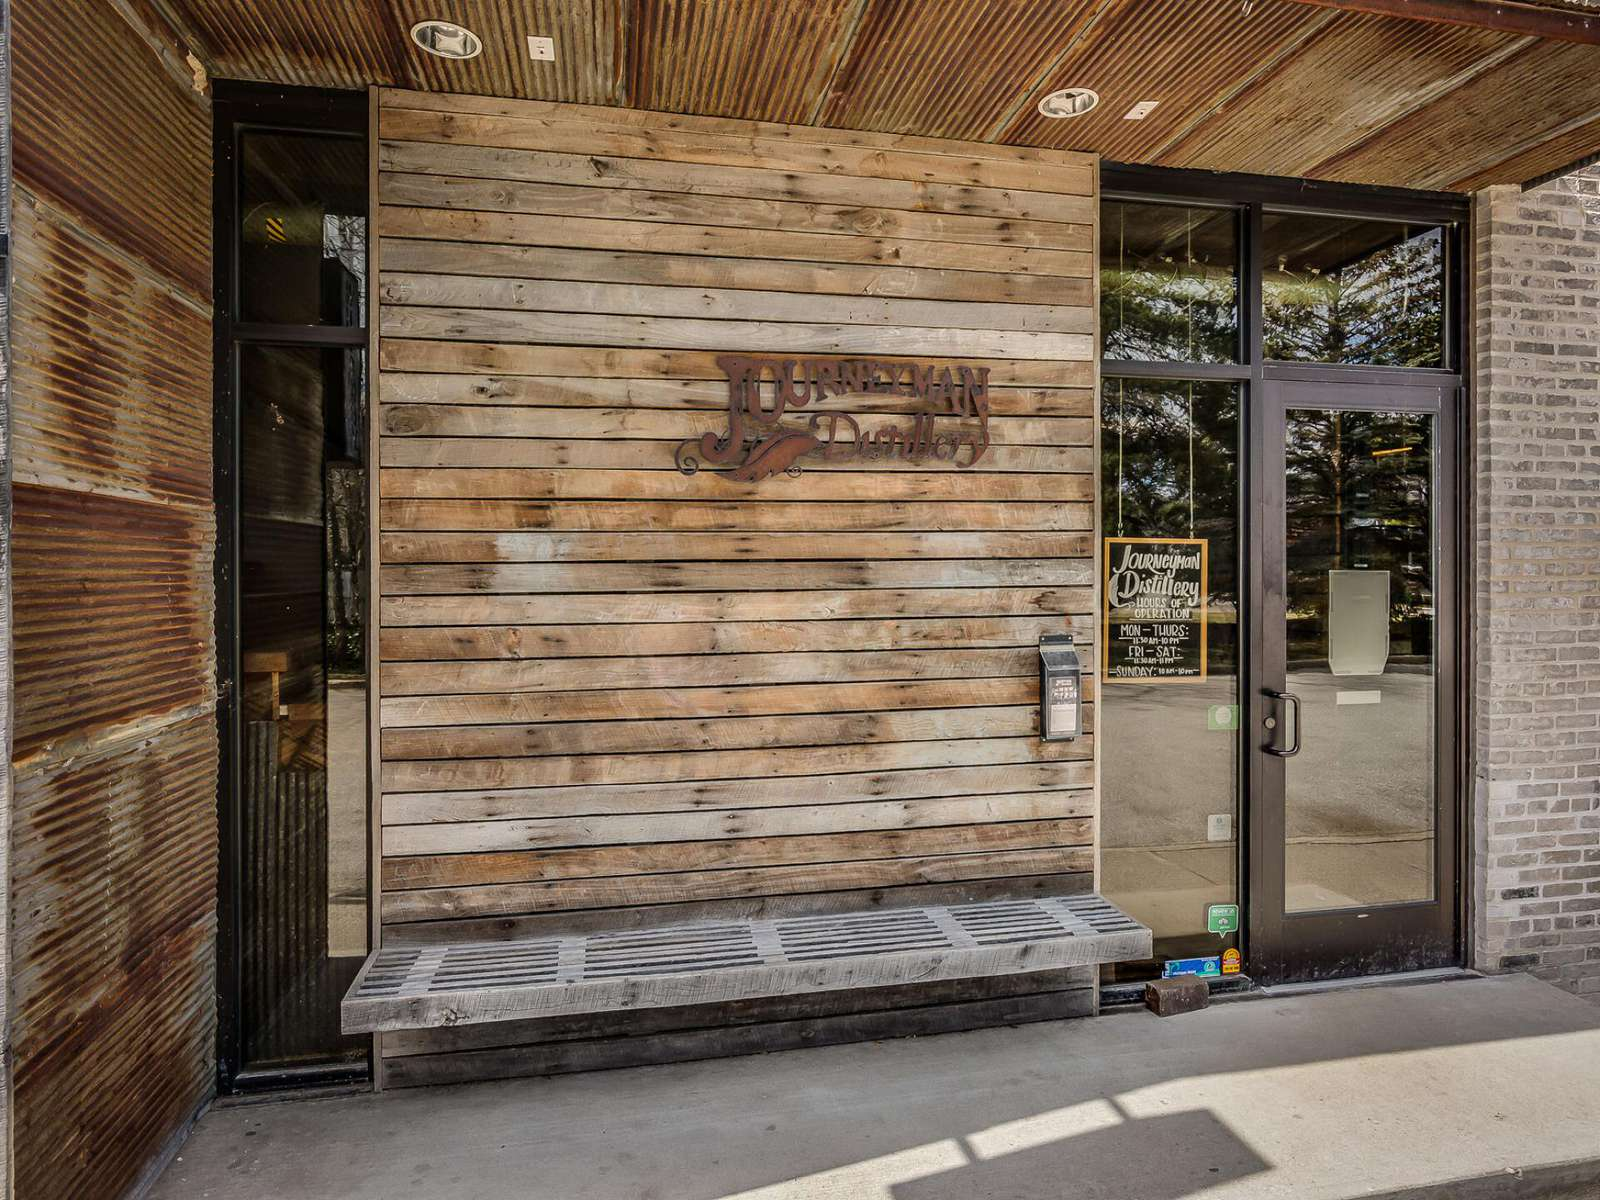 Journeyman Distillery - Three Oaks